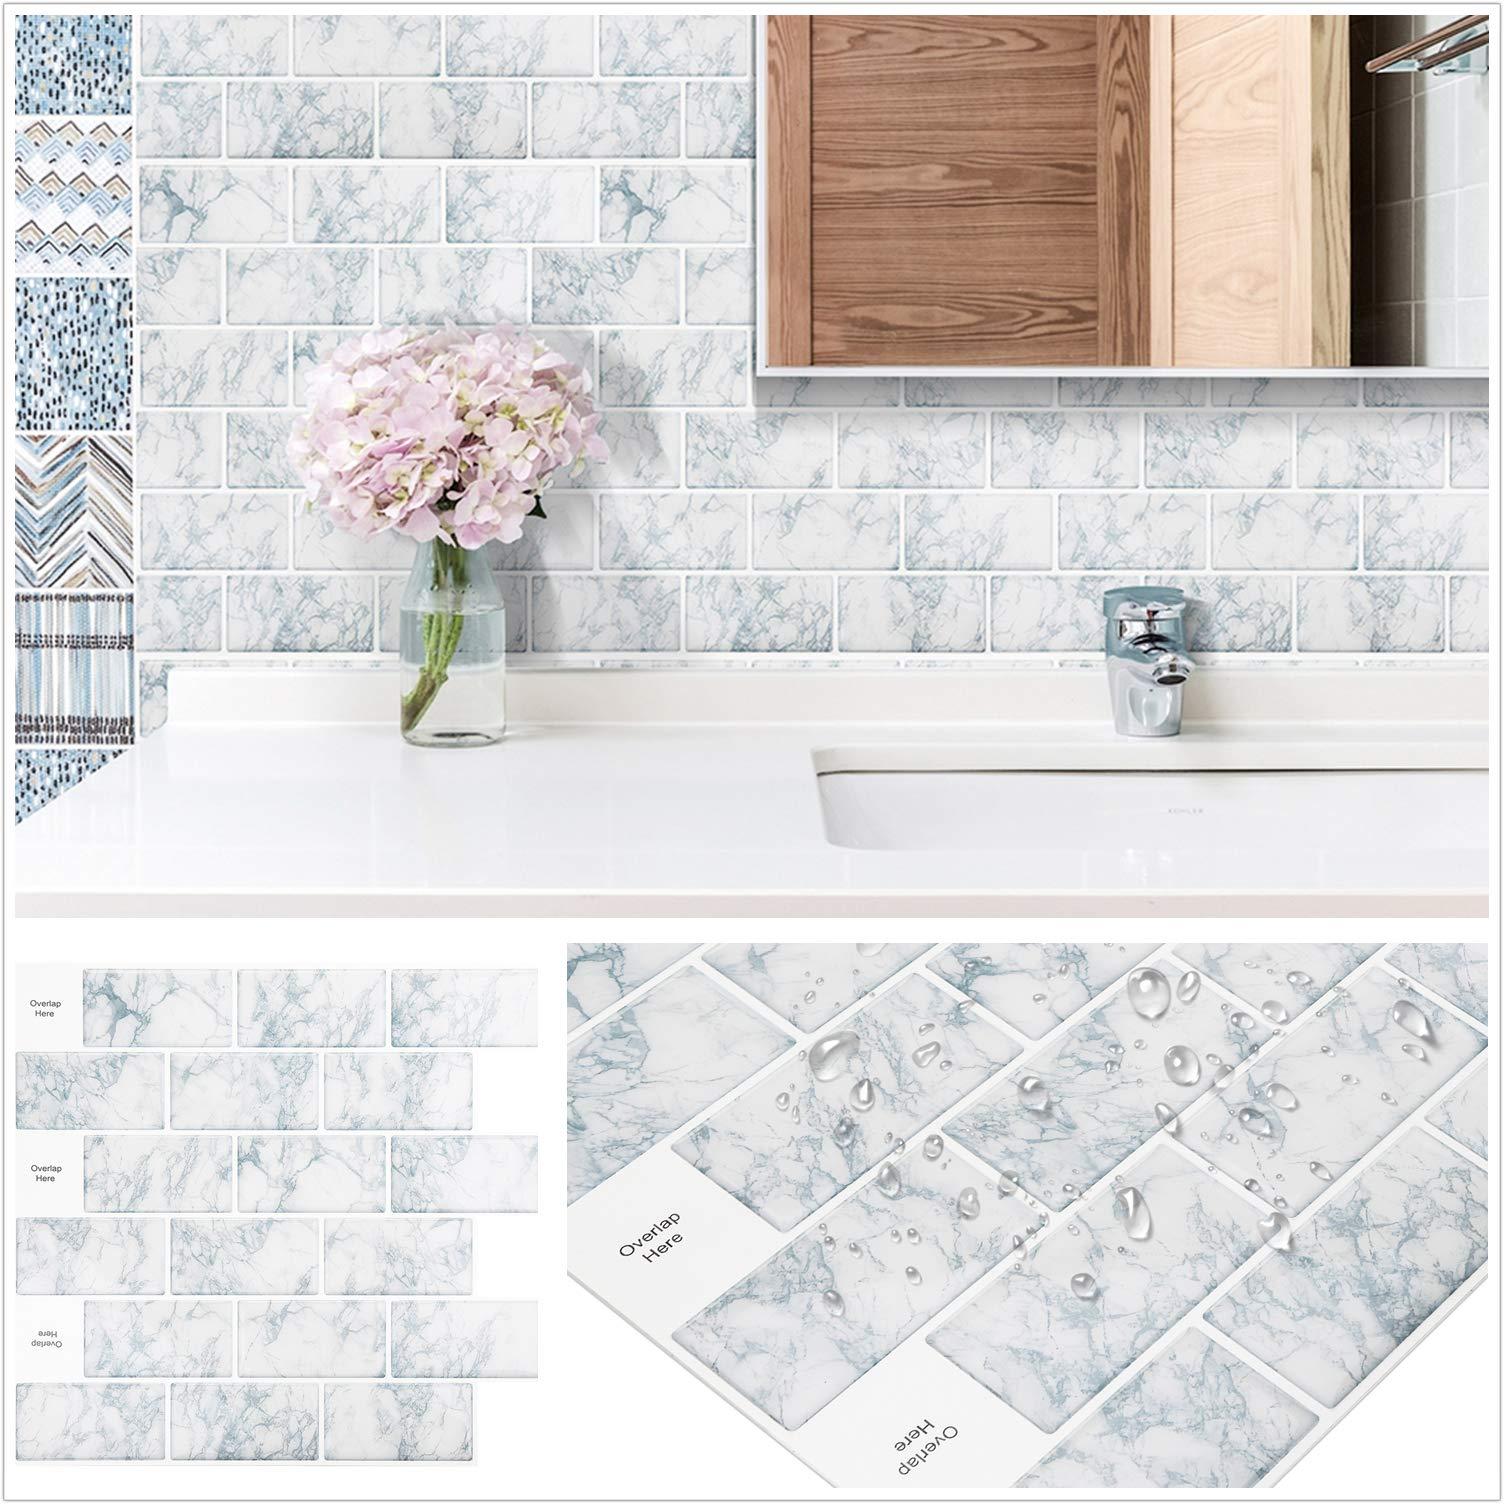 homeymosaic peel and stick tile for kitchen backsplash stick on tiles for kitchen 12x12 inches snowflake marble white subway tile with white